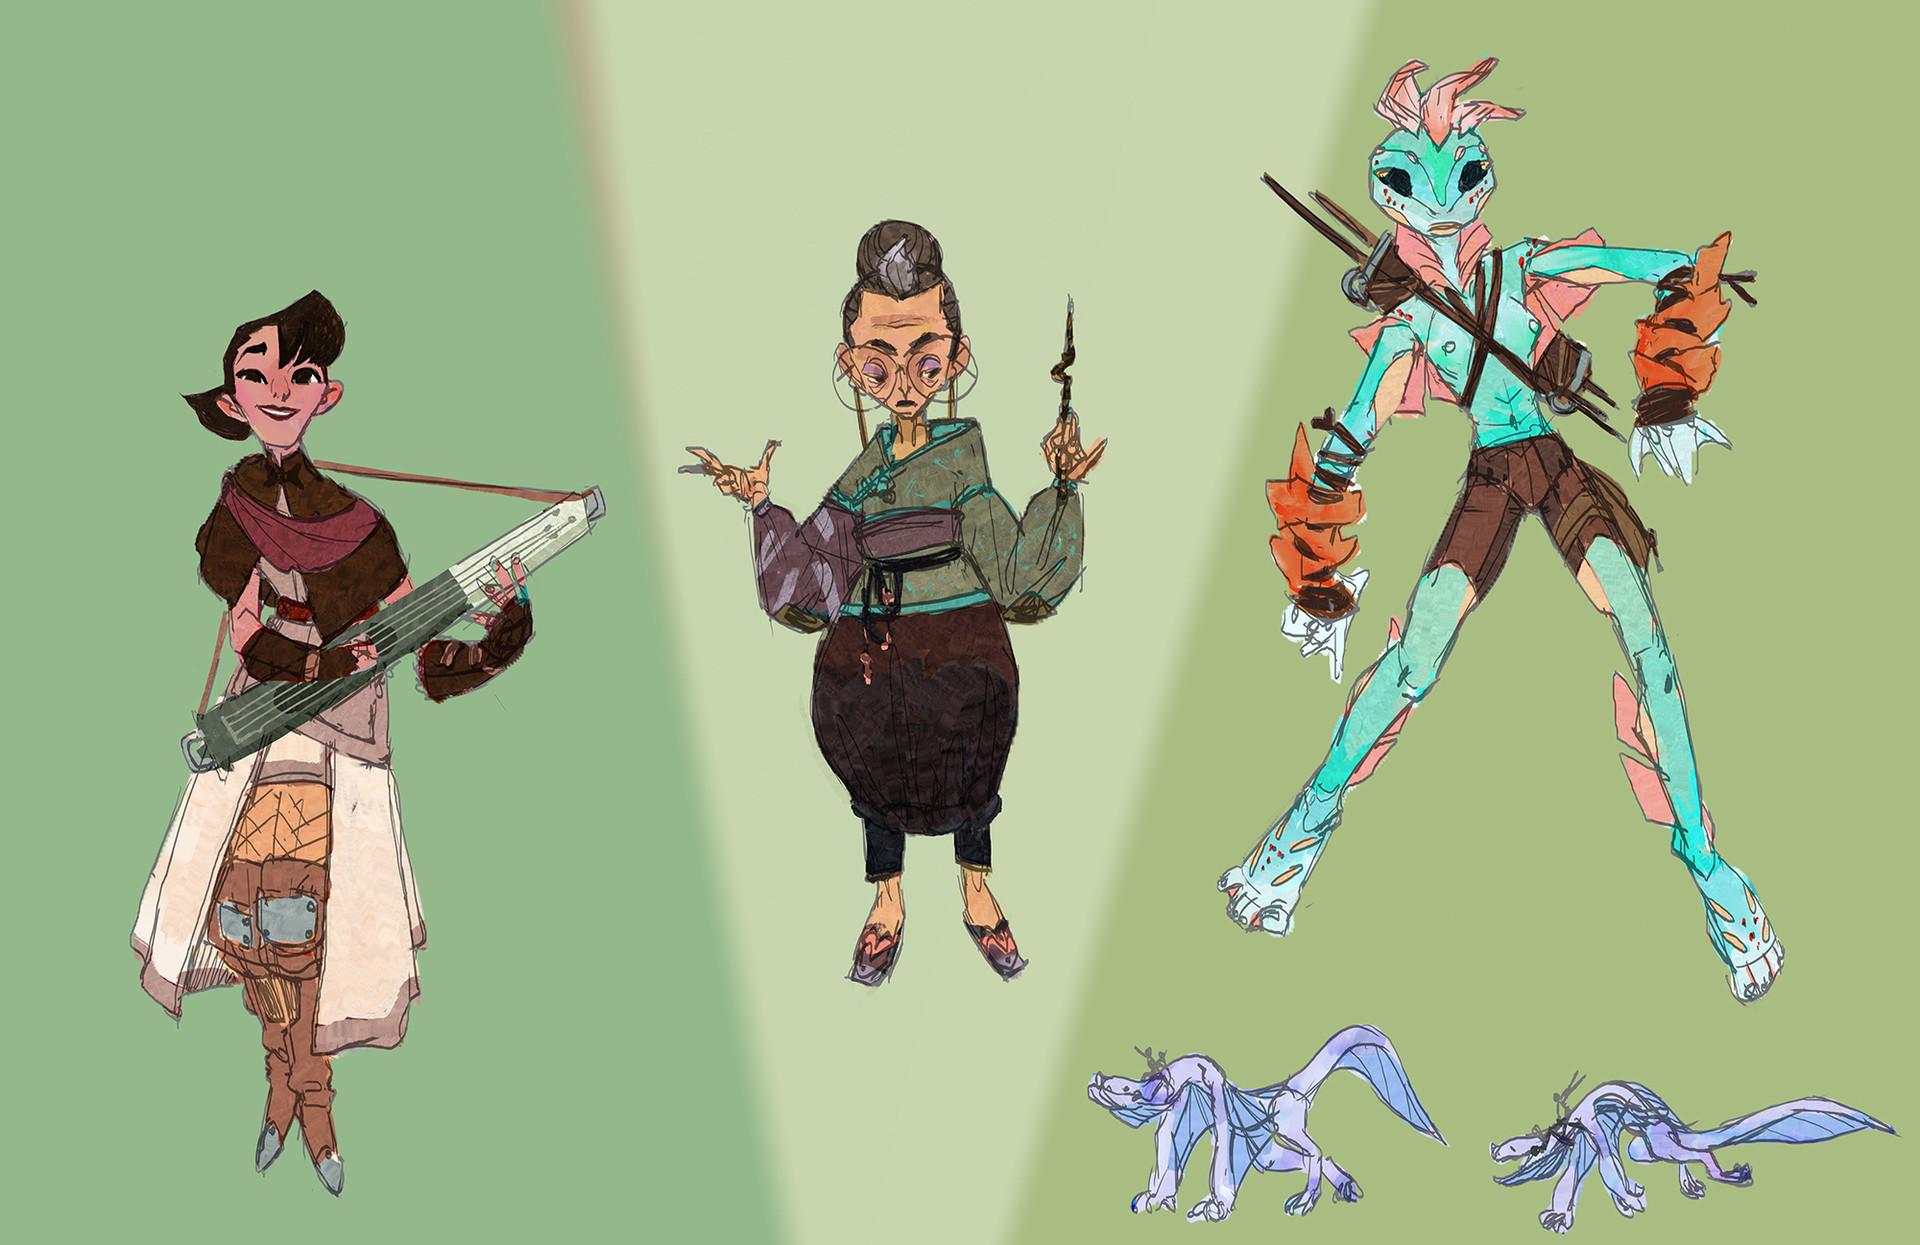 Fantasy: Bard, Librarian, Dragon Rider